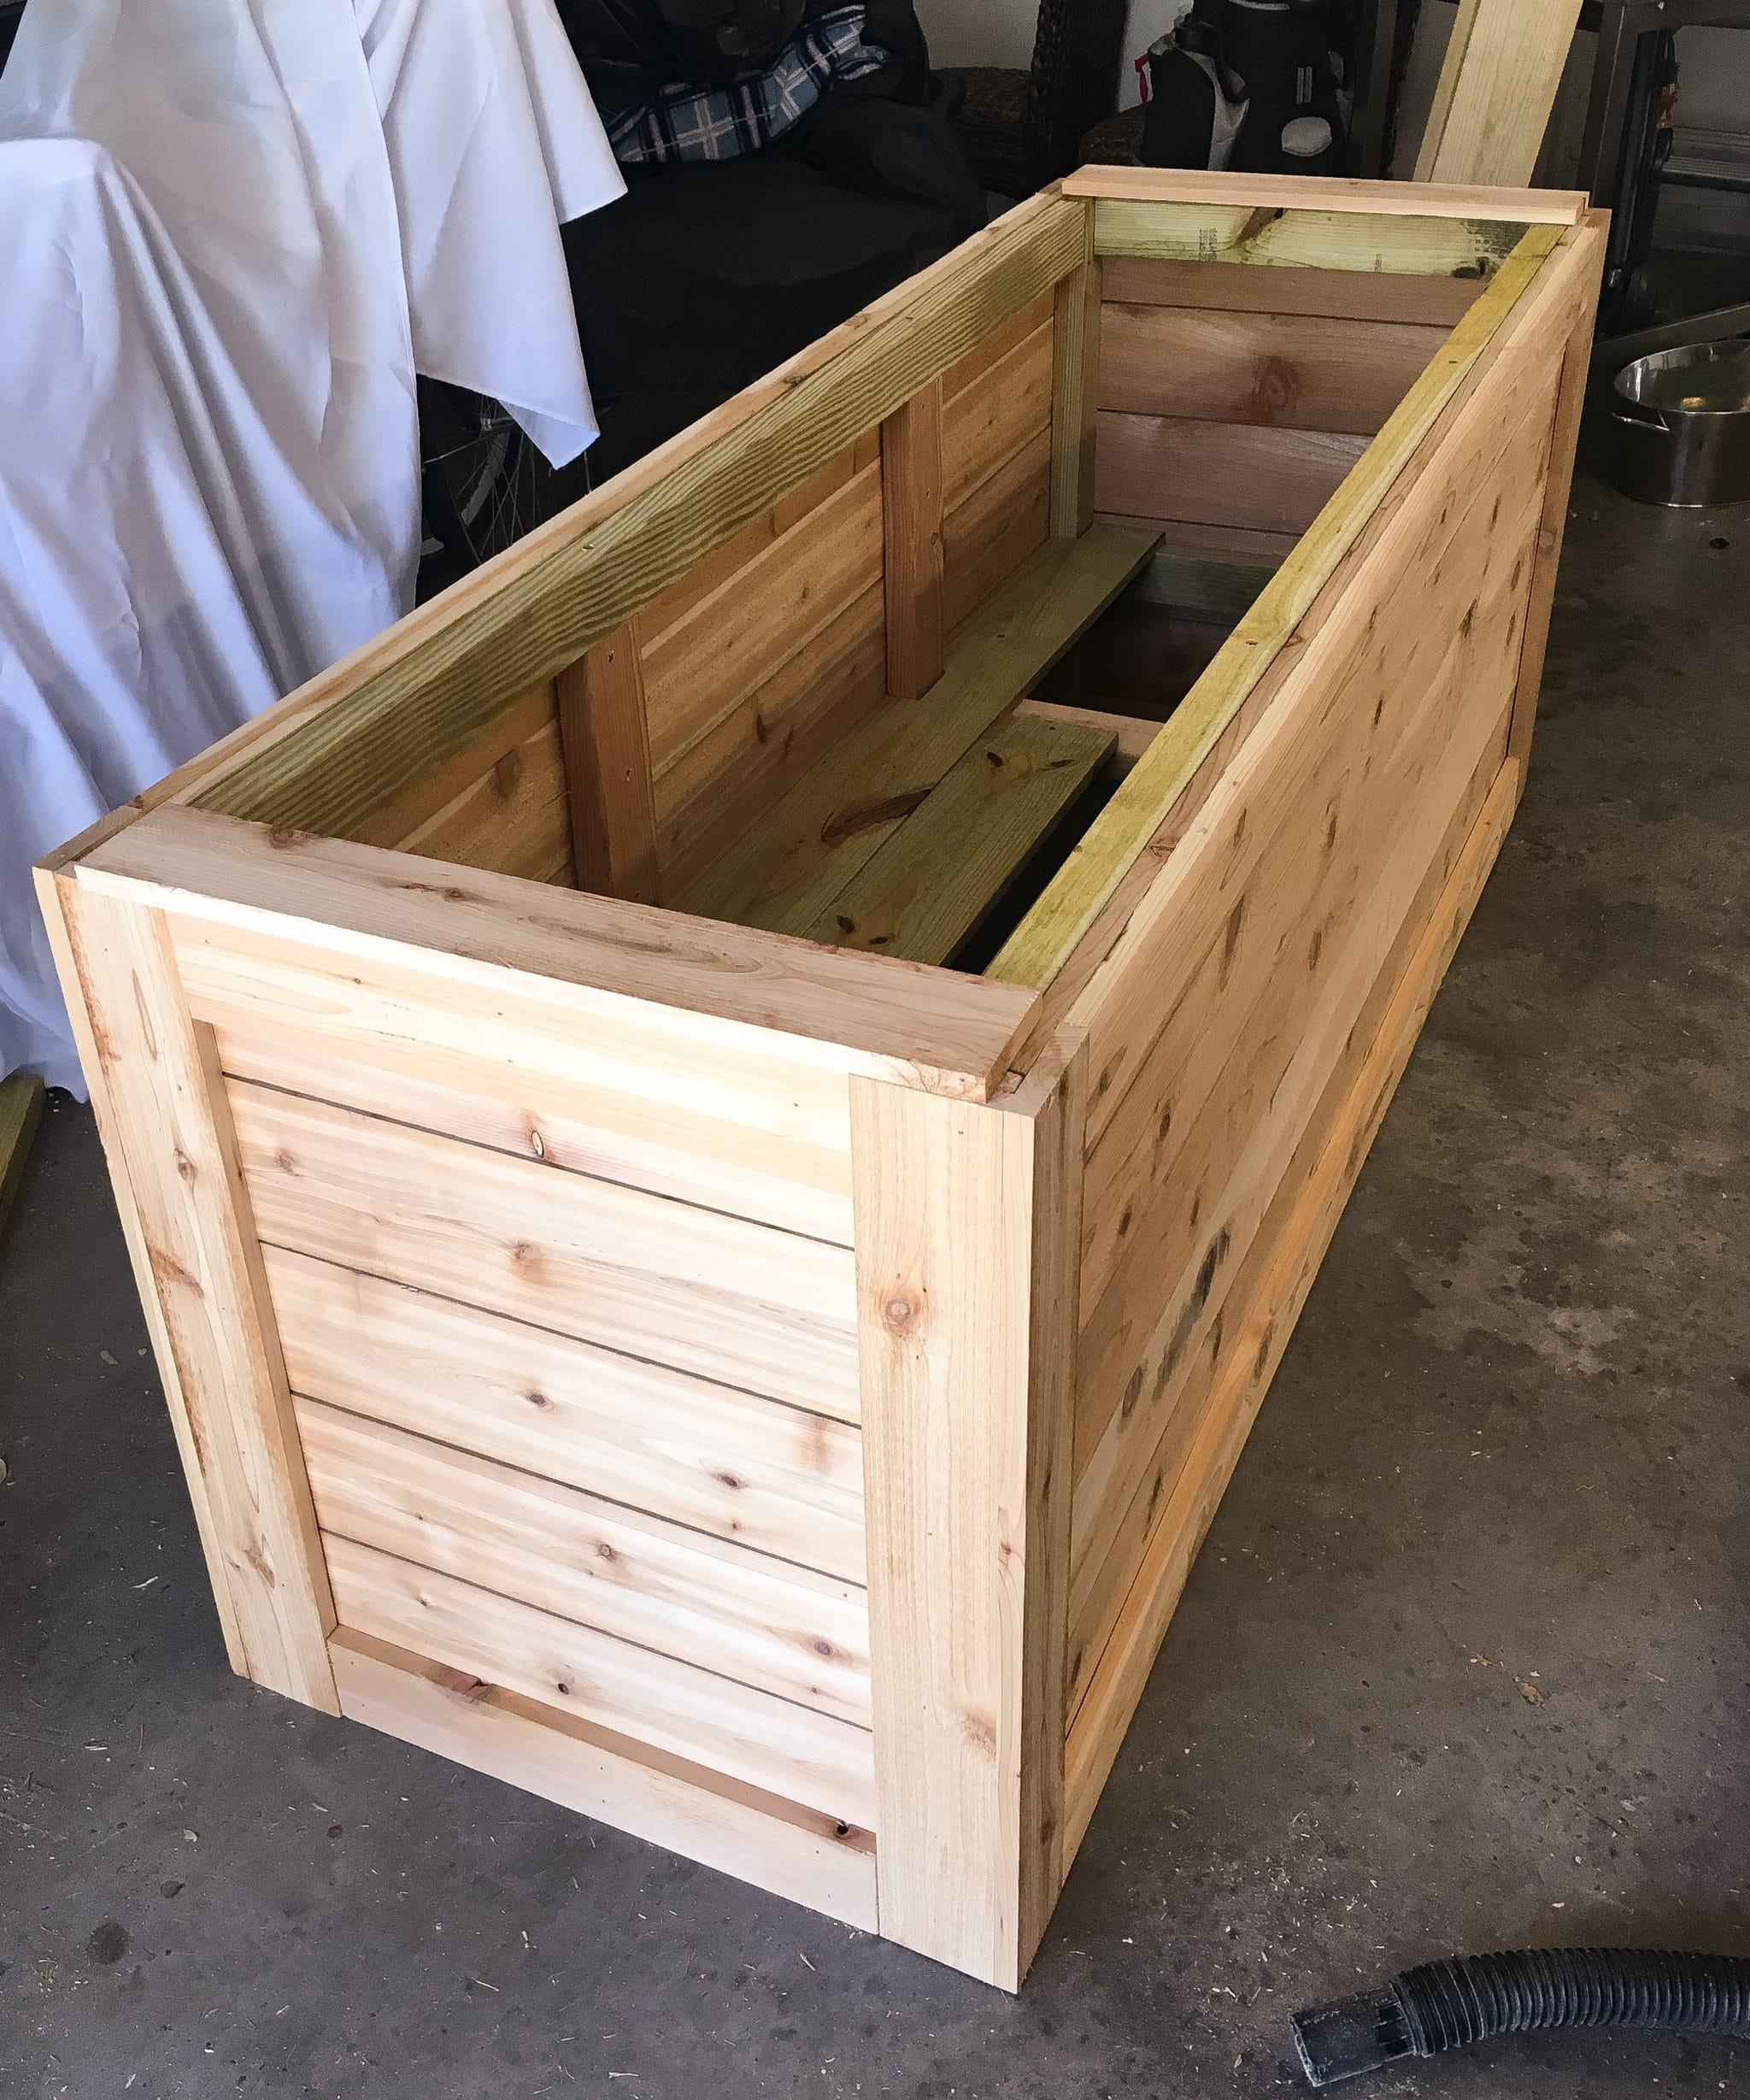 Best ideas about DIY Wood Planter . Save or Pin BACKYARD DIY SERIES PART IIII Cedar Wood Planter Box Now.